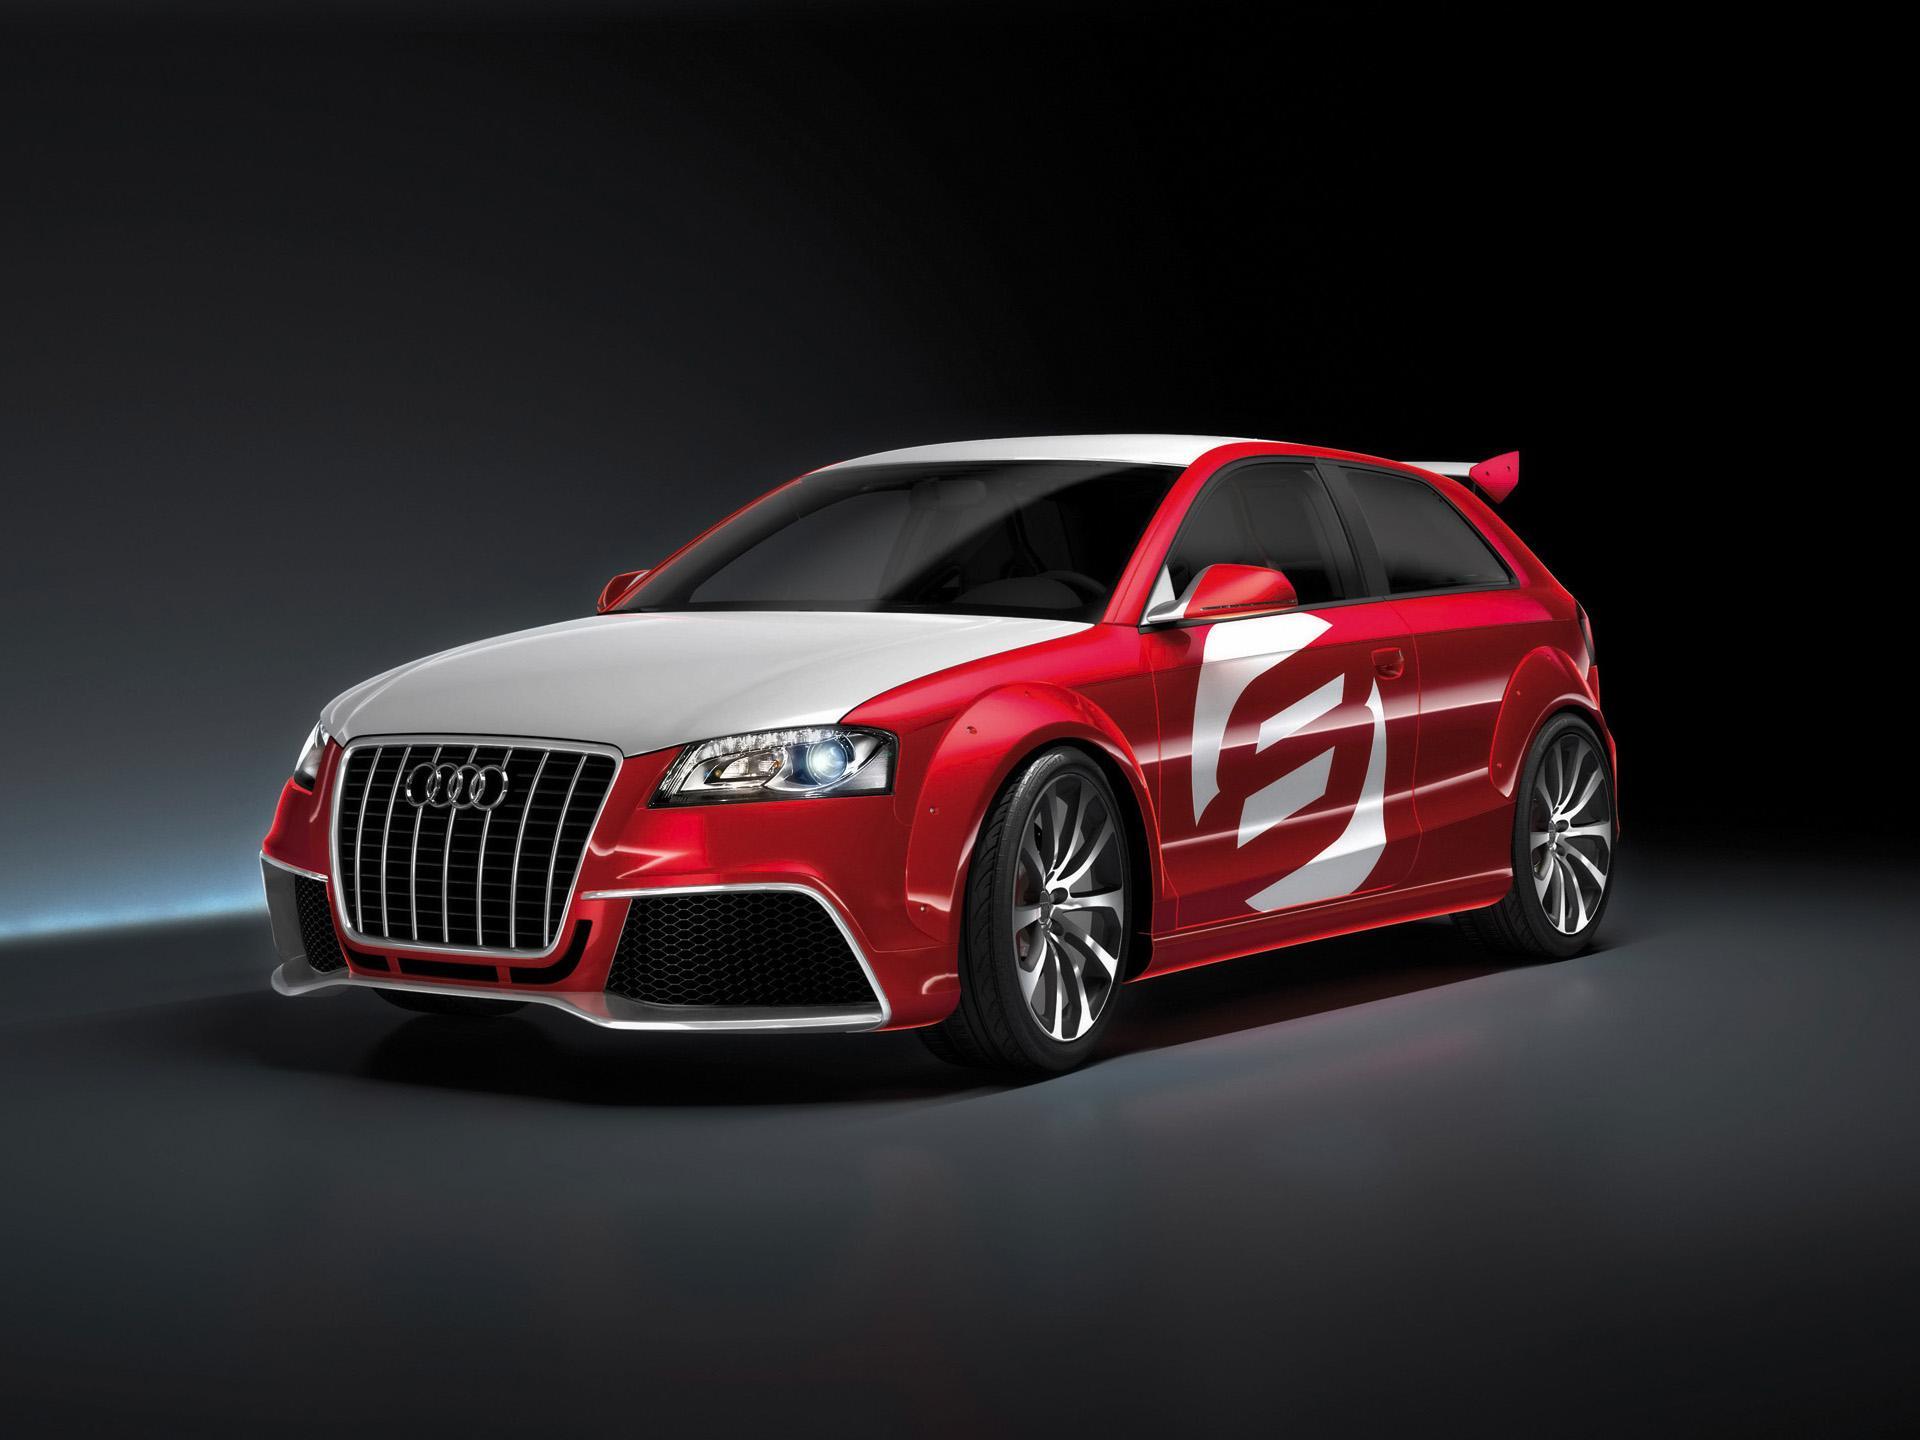 2008 Audi A3 Tdi Clubsport Quattro News And Information